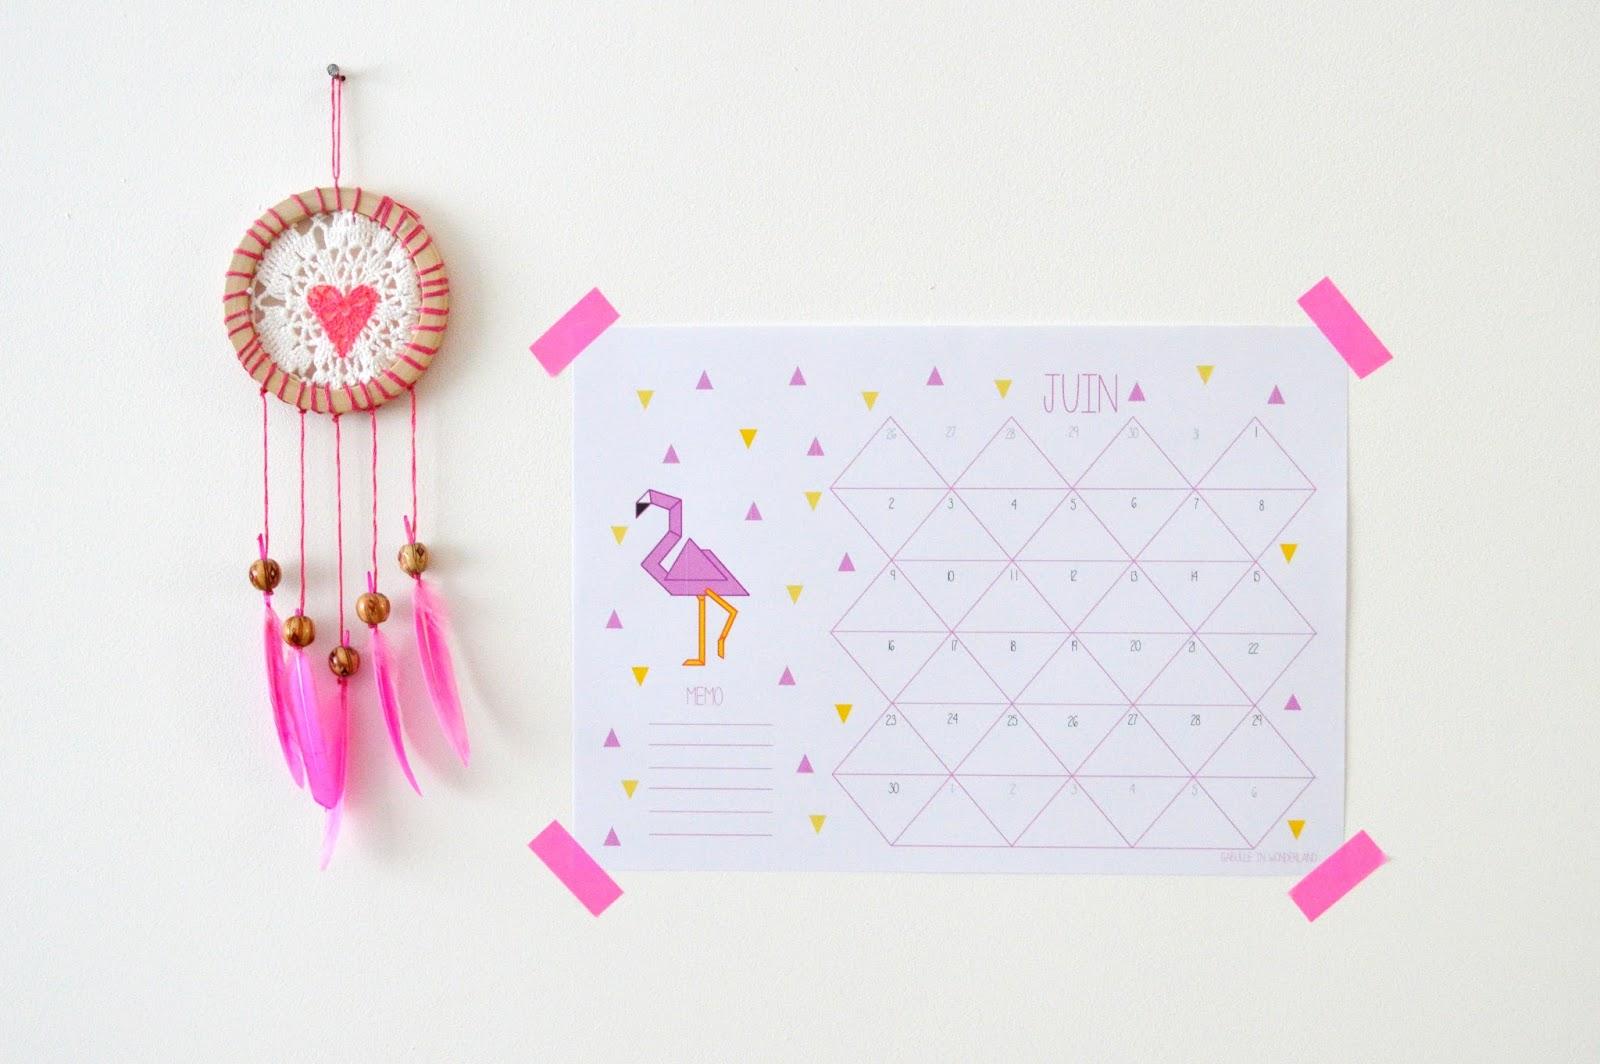 Coloriage Licorne Princesse a Imprimer Gratuit - Coloriage Licorne Gratuit